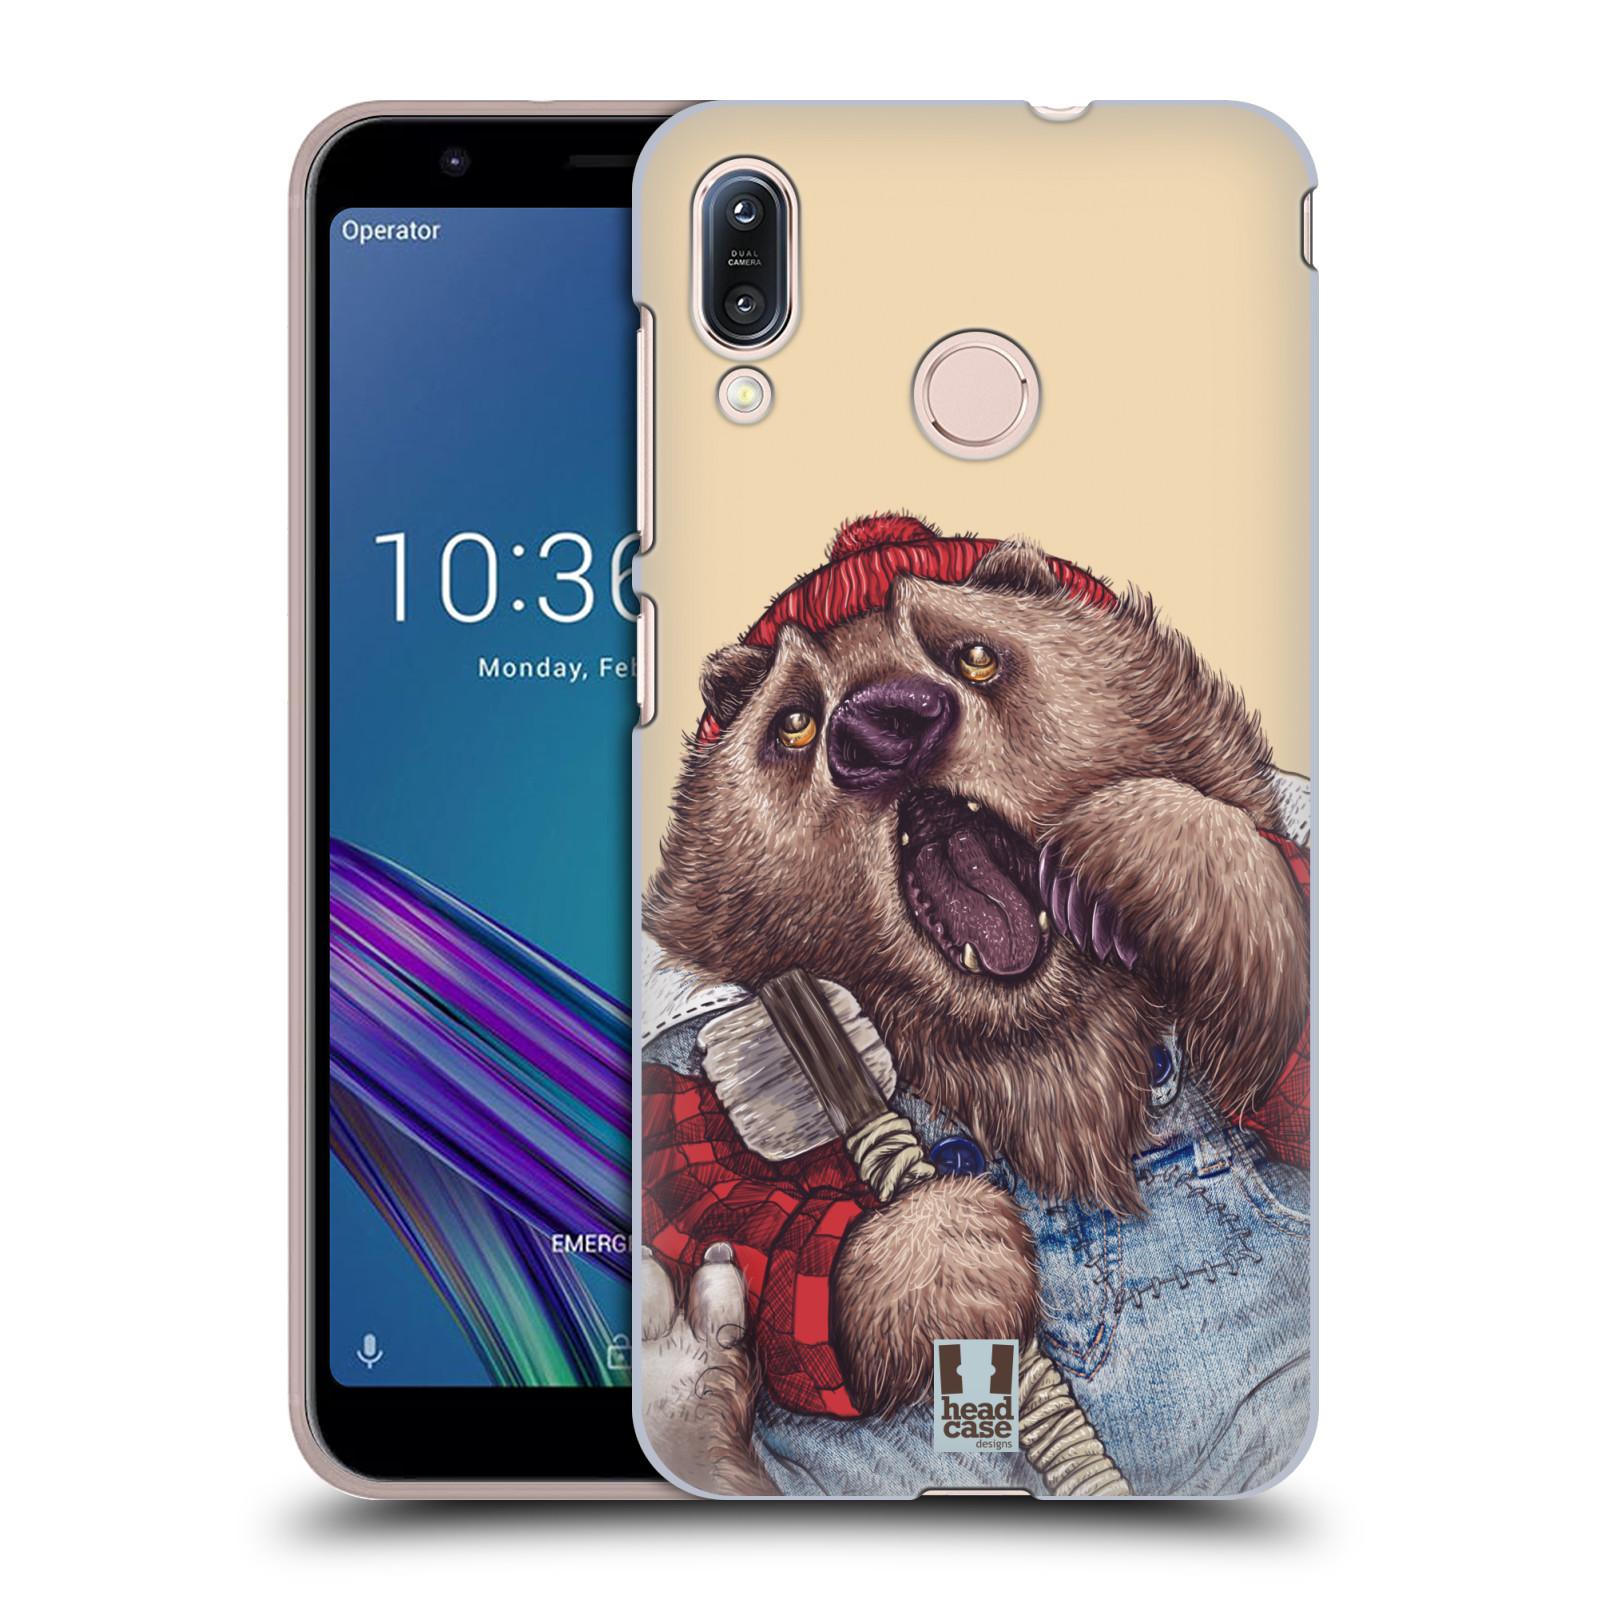 Plastové pouzdro na mobil Asus Zenfone Max M1 ZB555KL - Head Case - ANIMPLA MEDVĚD